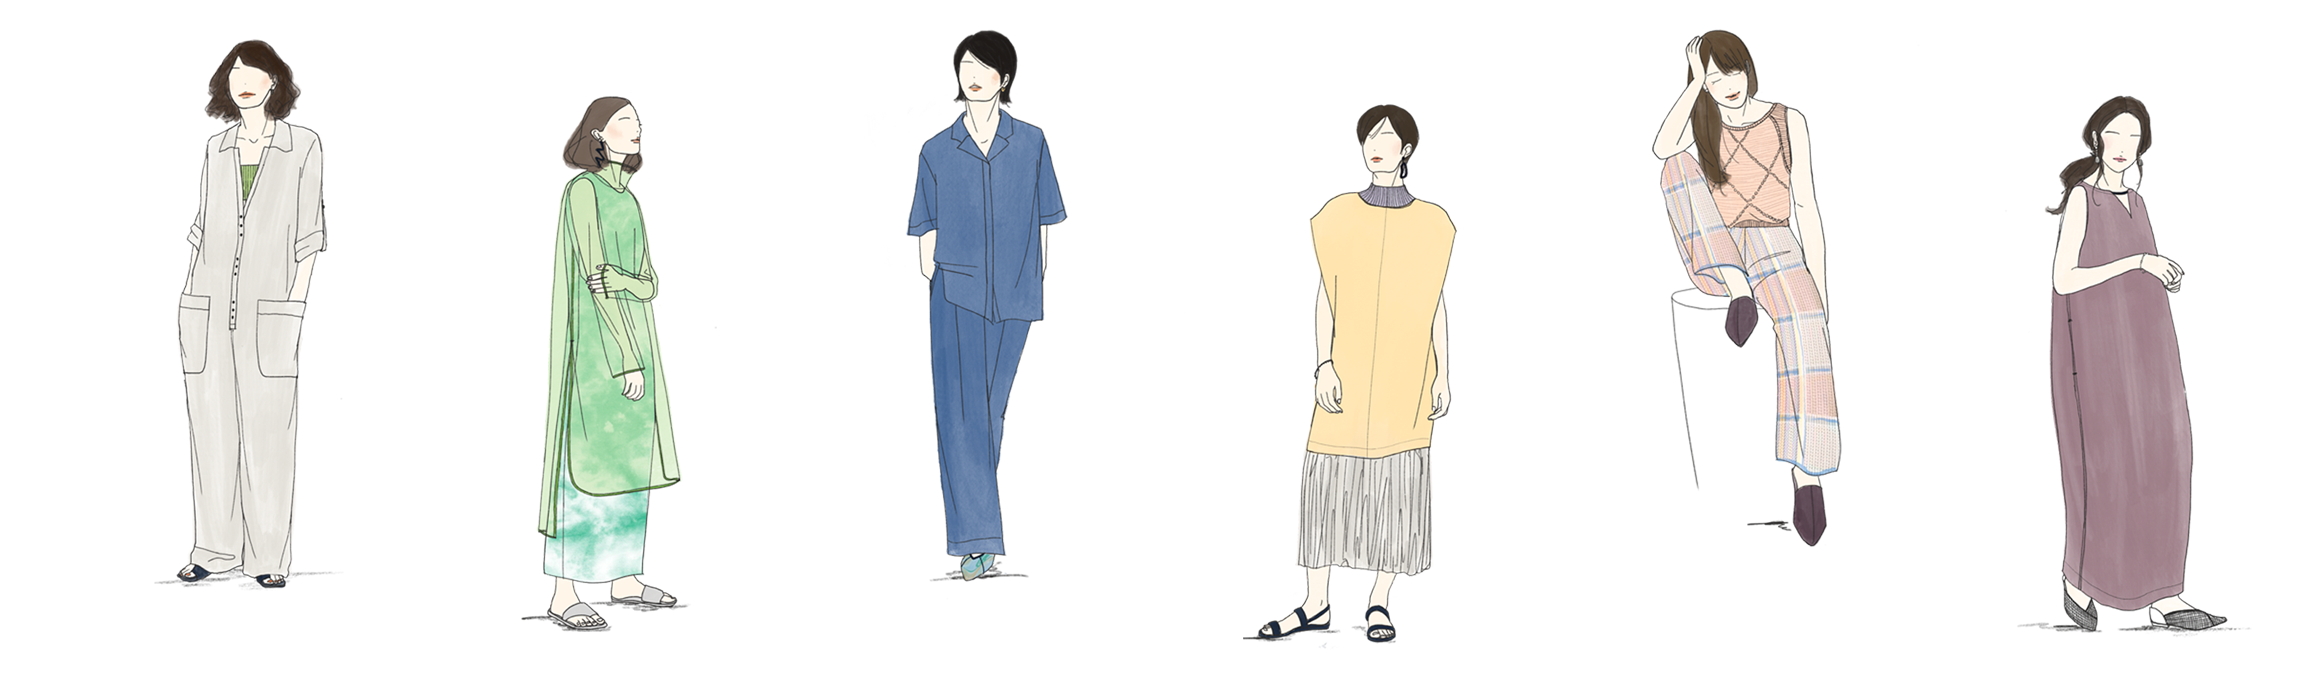 2022ss 2022春夏 ファッショントレンド スタイリング